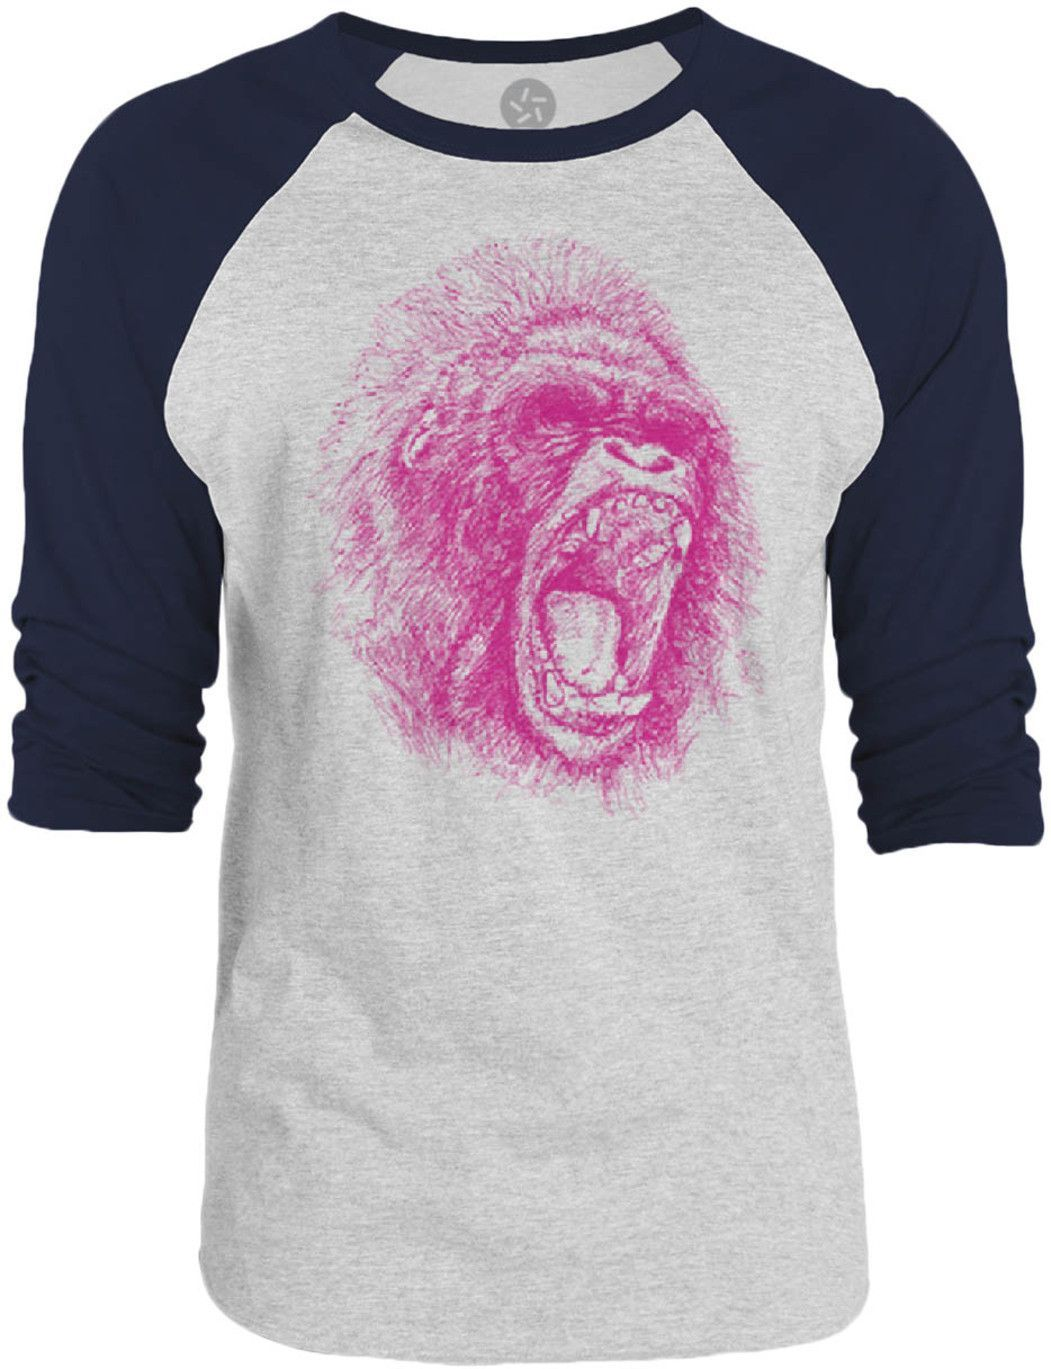 Big Texas Ape (Pink) 3/4-Sleeve Raglan Baseball T-Shirt